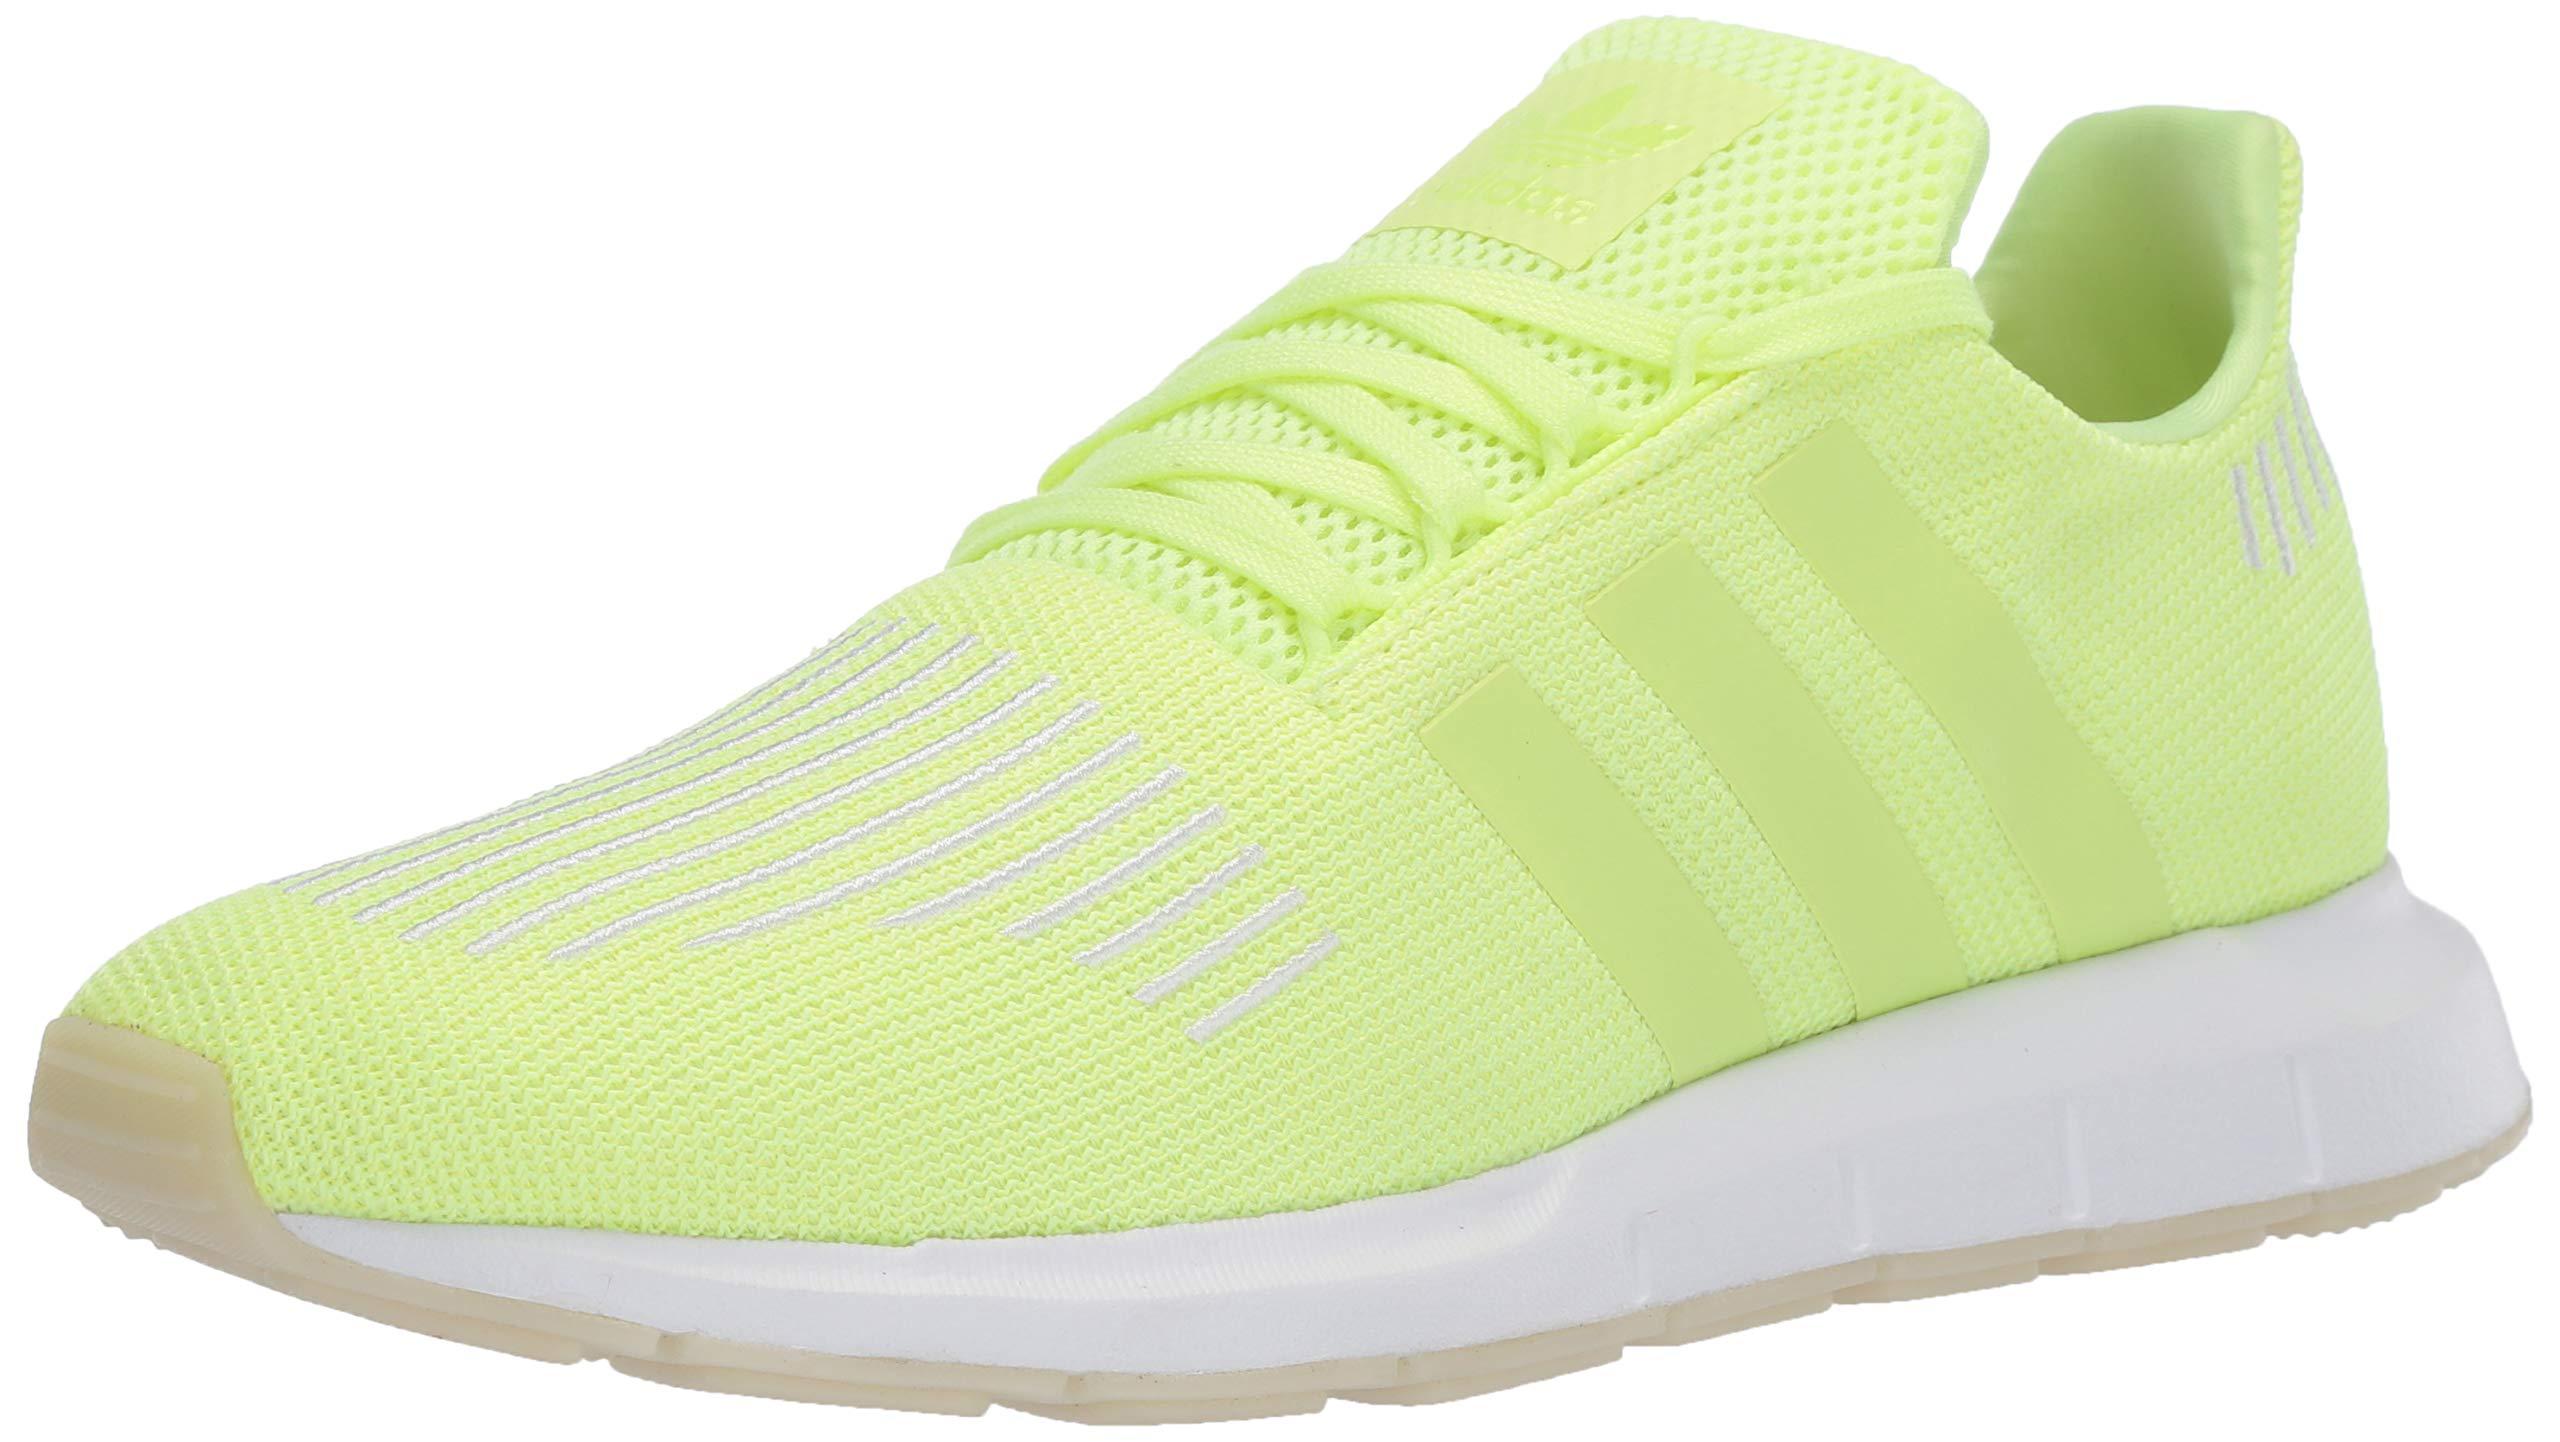 a87ad399aa158 Adidas Men's Swift Run Shoes,White/Core Black/Medium Grey Heather,11.5 M US